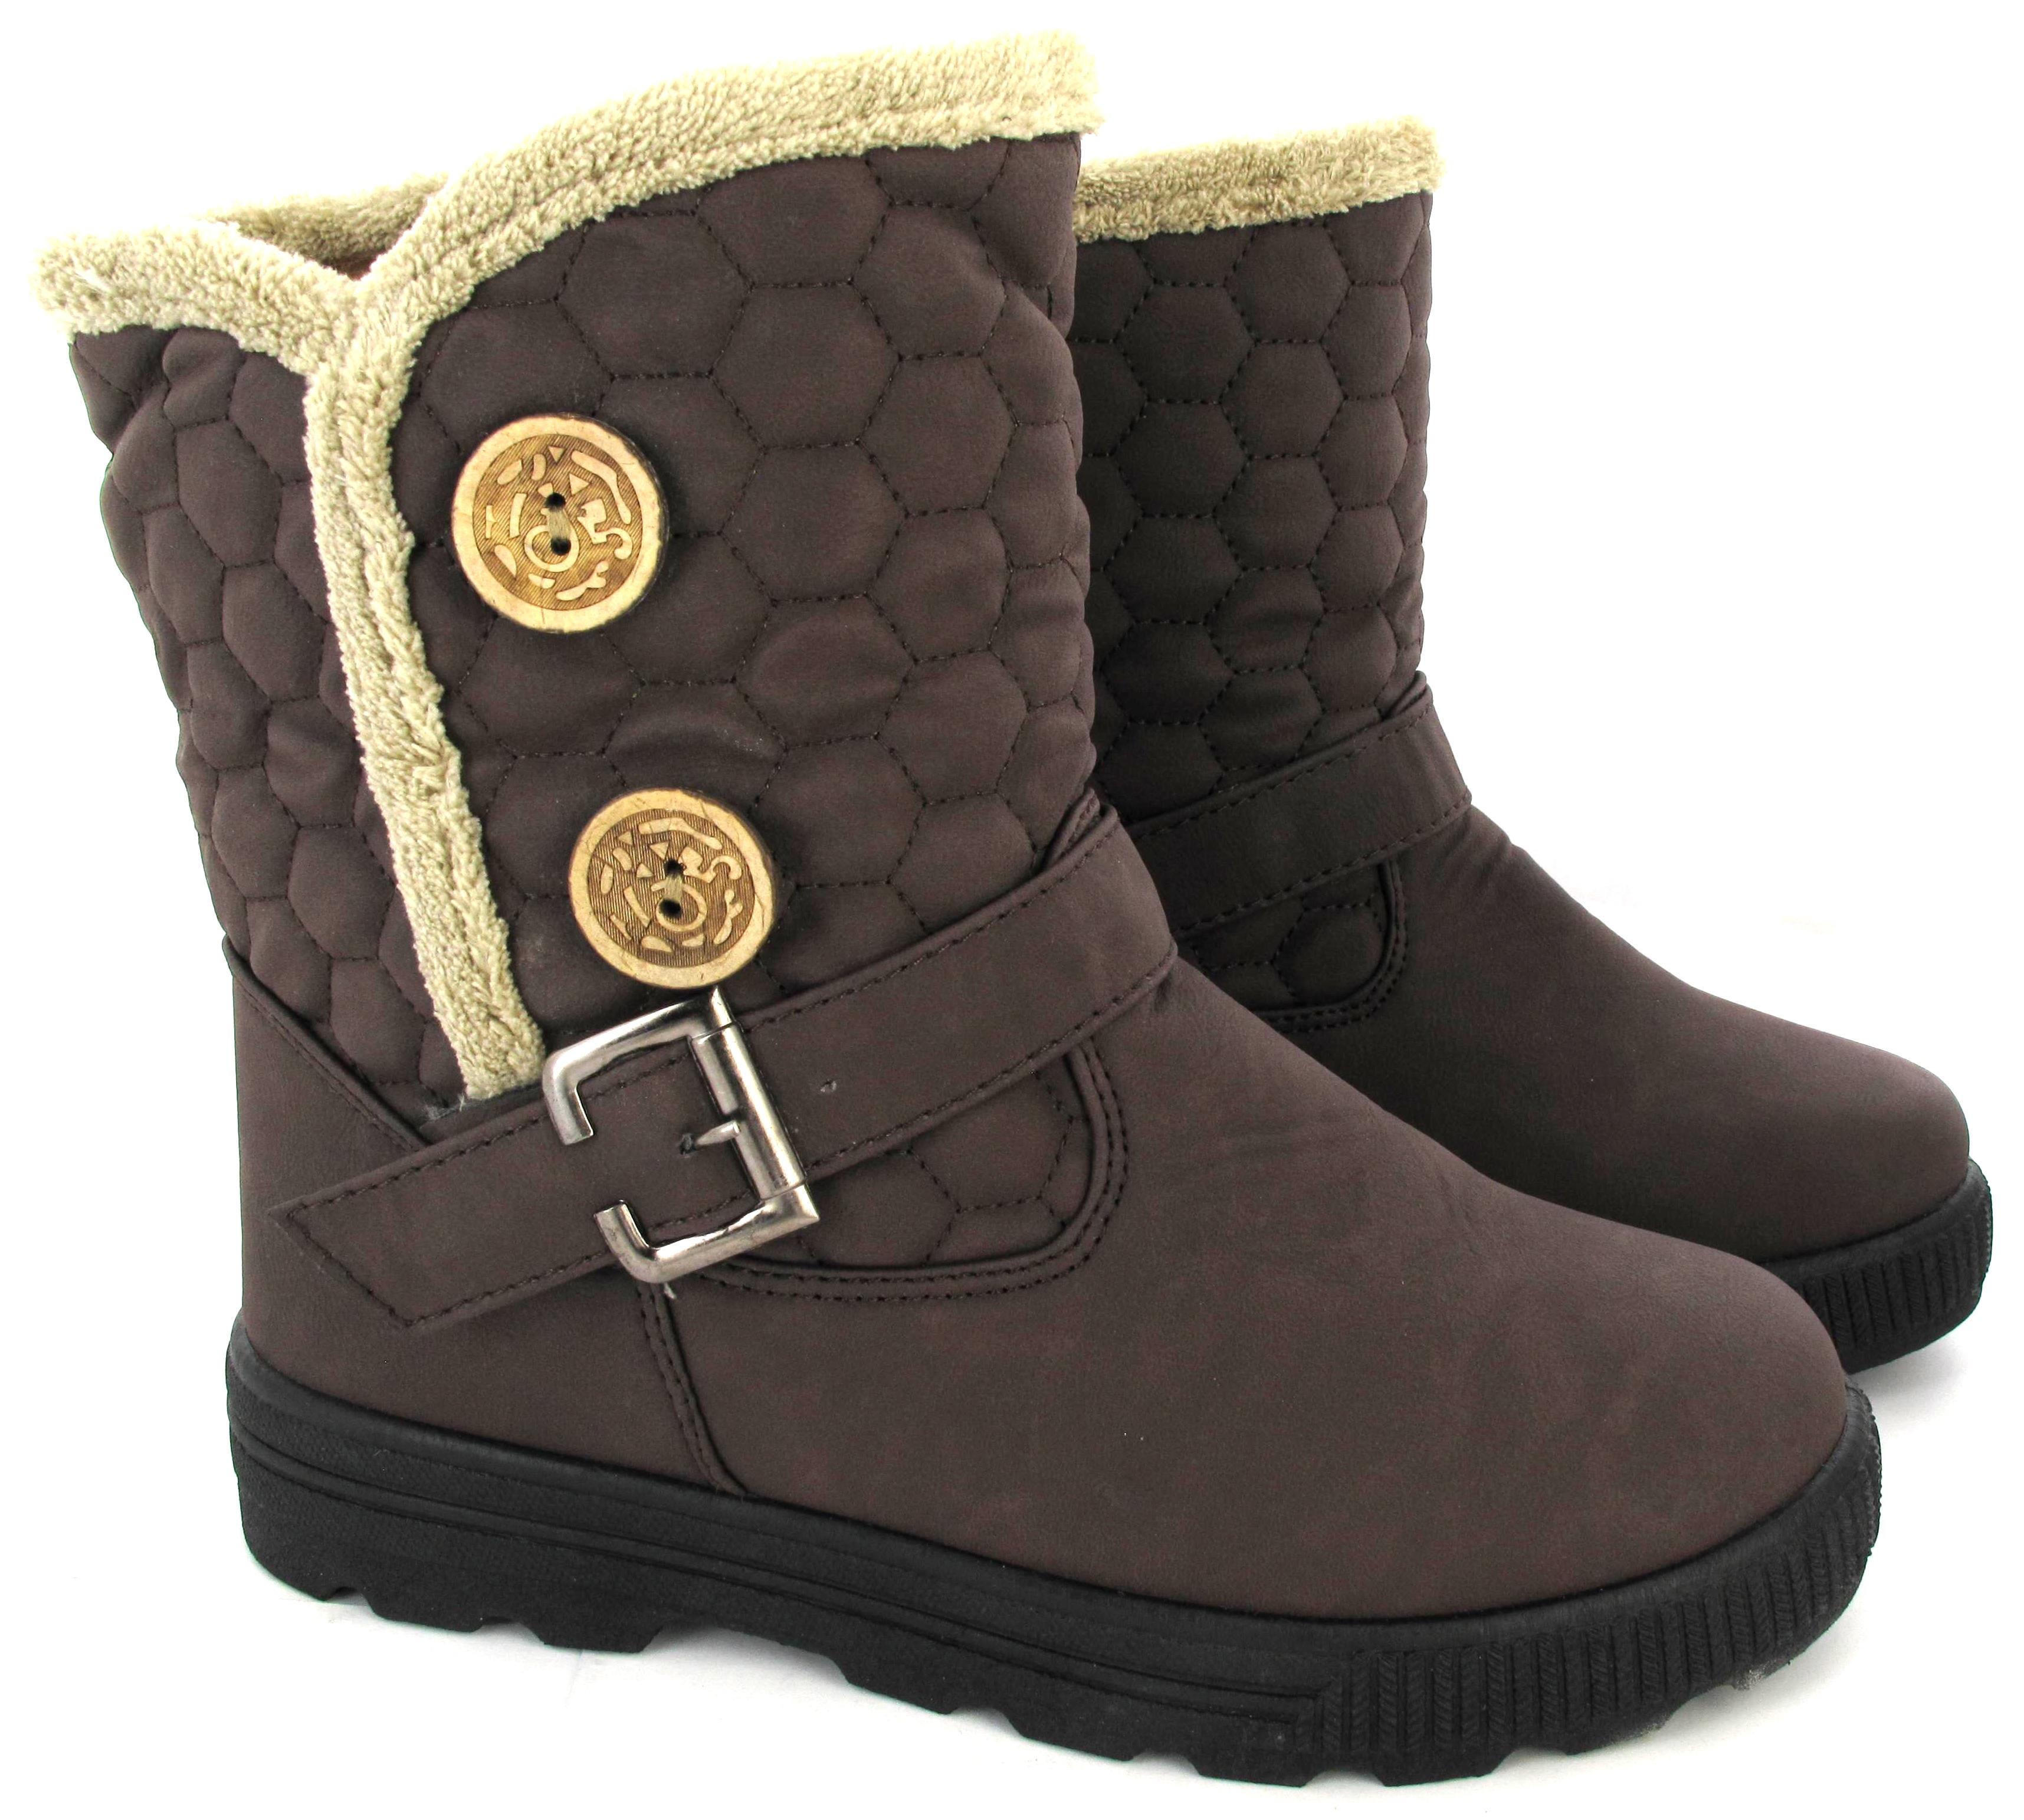 Stylish snow boots women